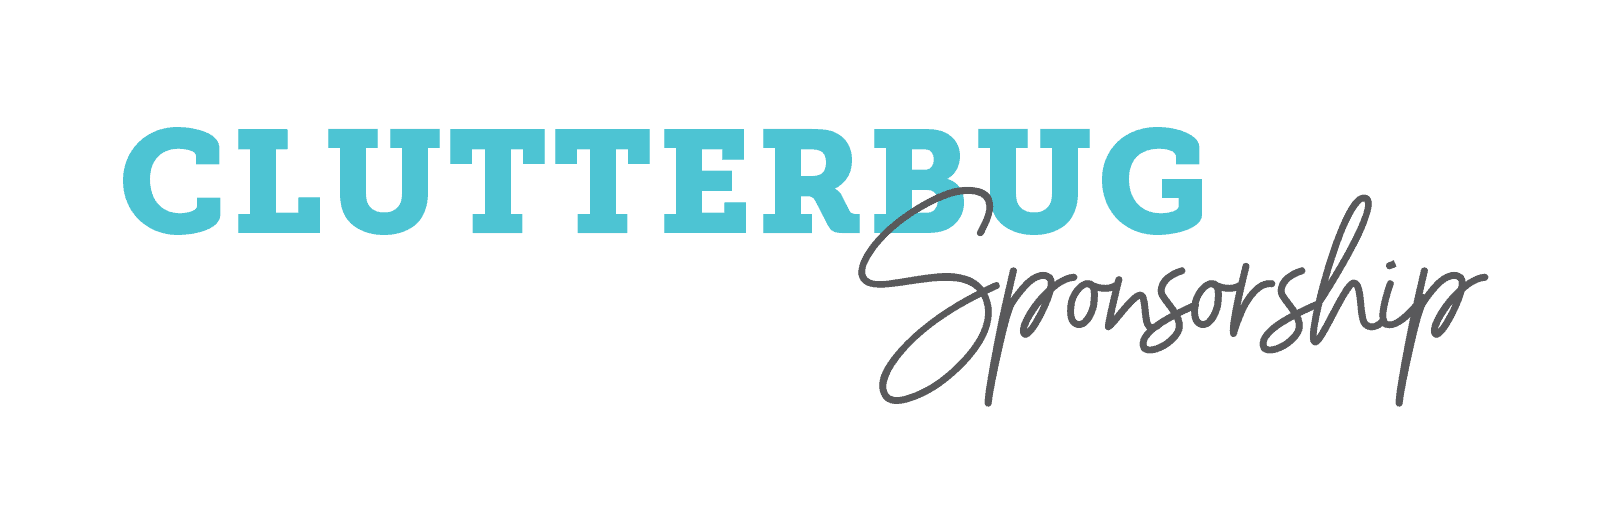 clutterbug sponsorship